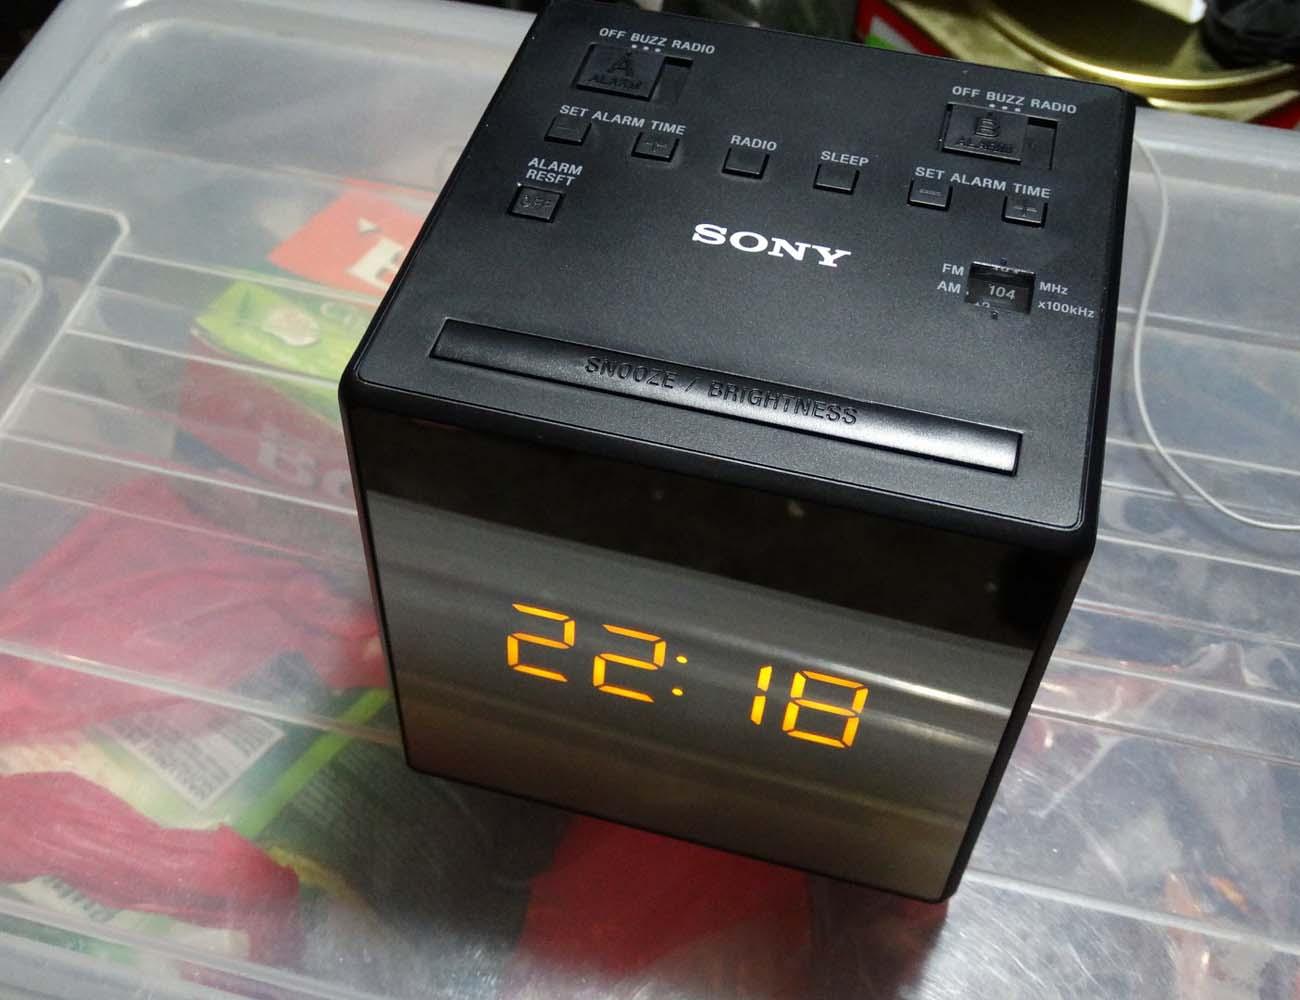 Sony Icfc1 Alarm Clock Radio 187 Gadget Flow